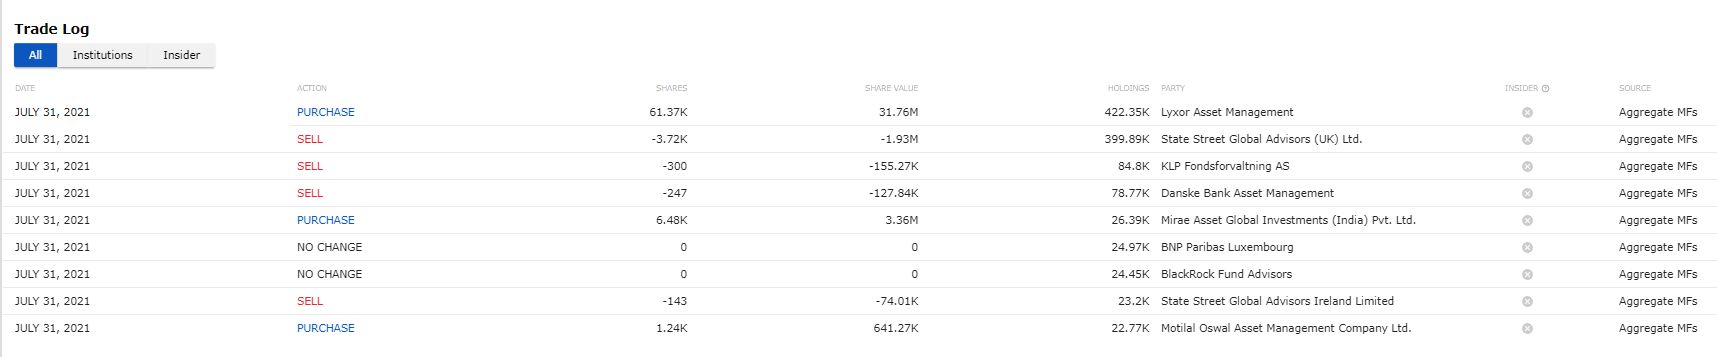 Insider trading log